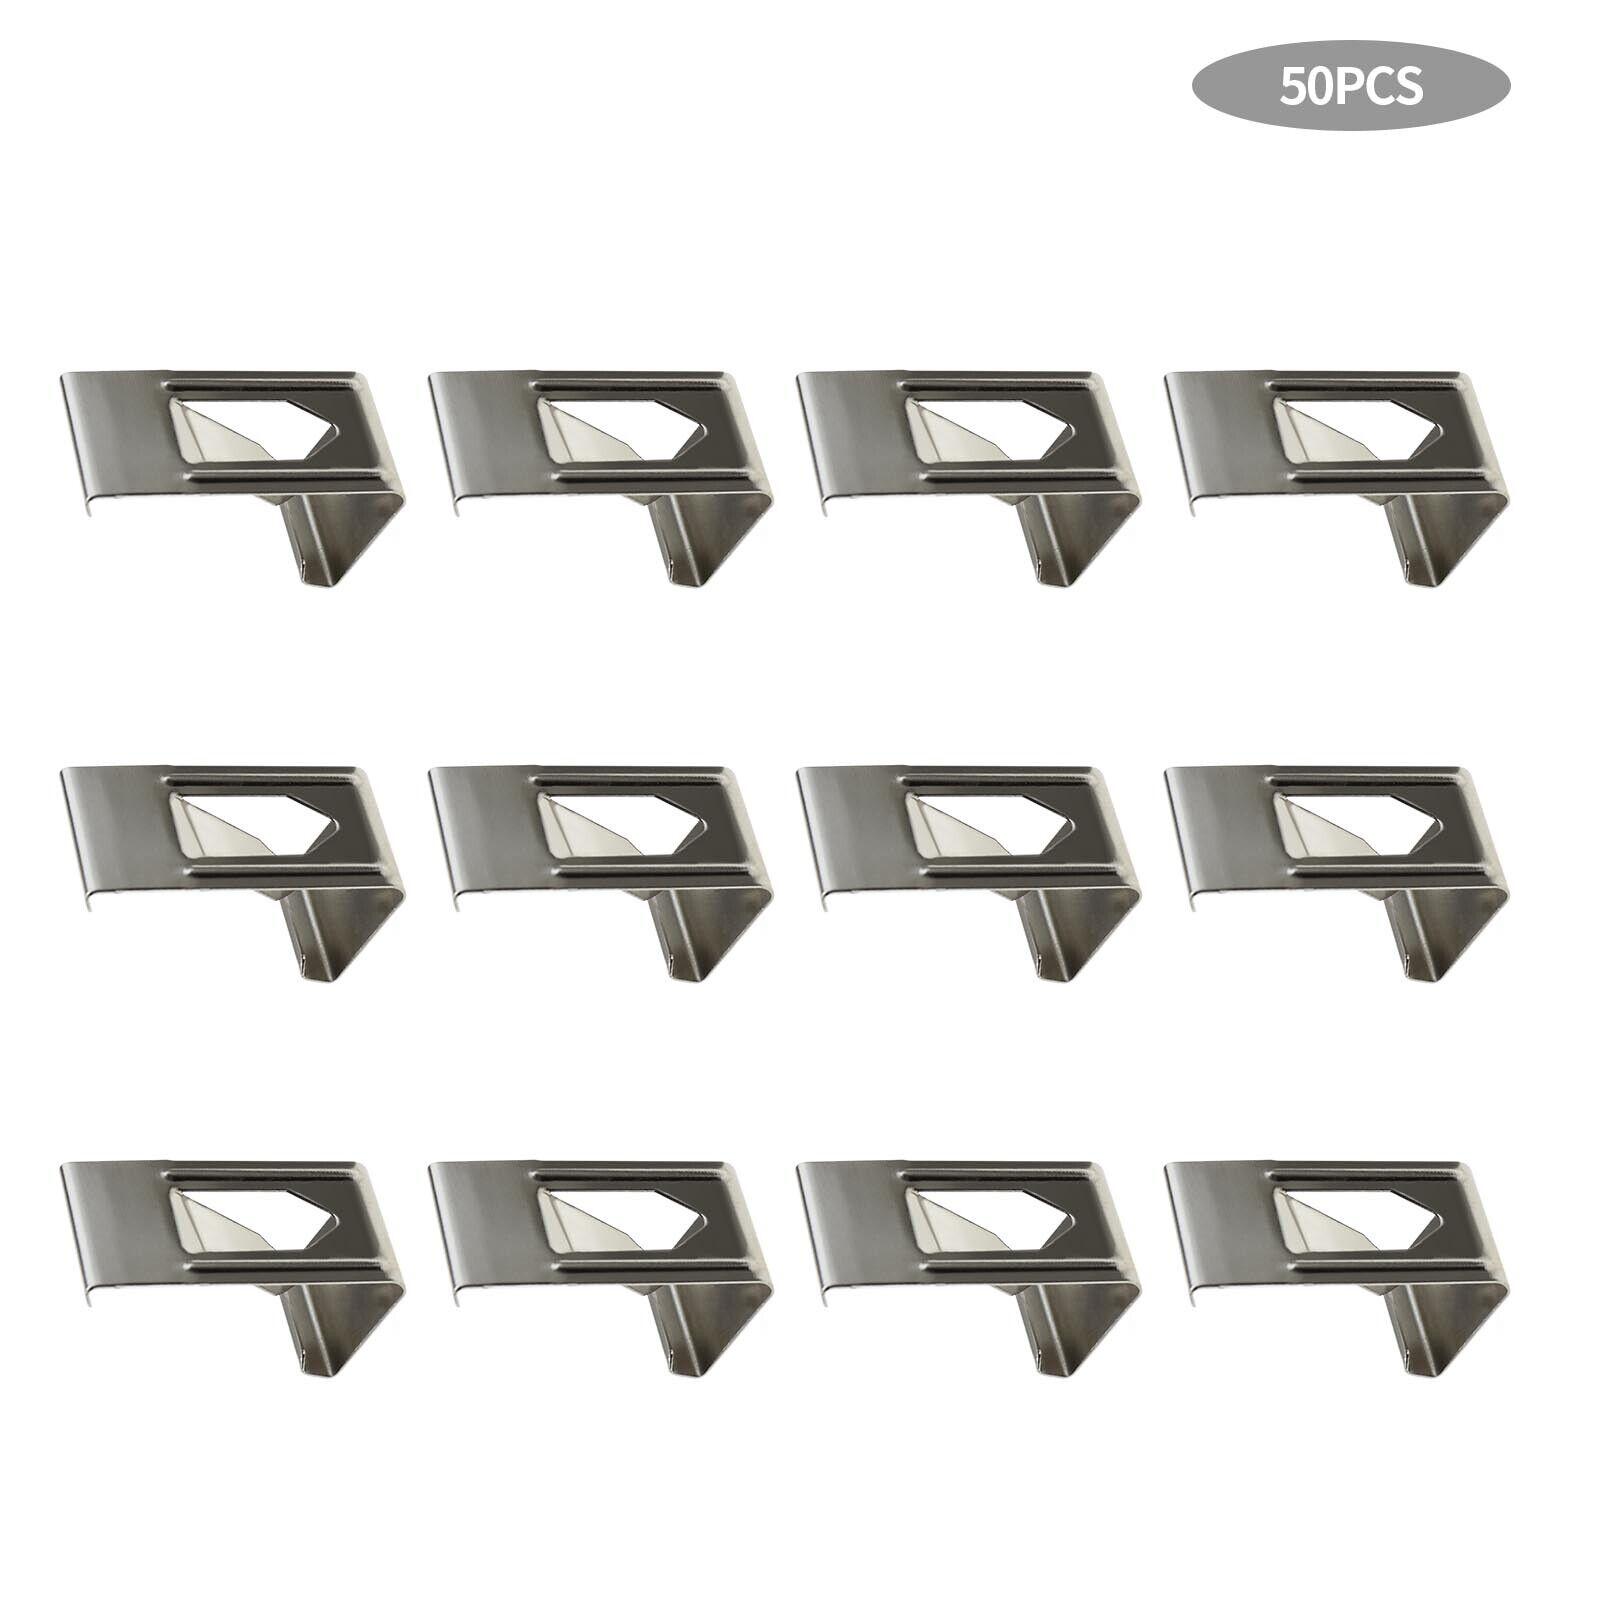 50 Pcs Silver Photography Photo Frame Metal Spring Turn Clip Hanger Hooks